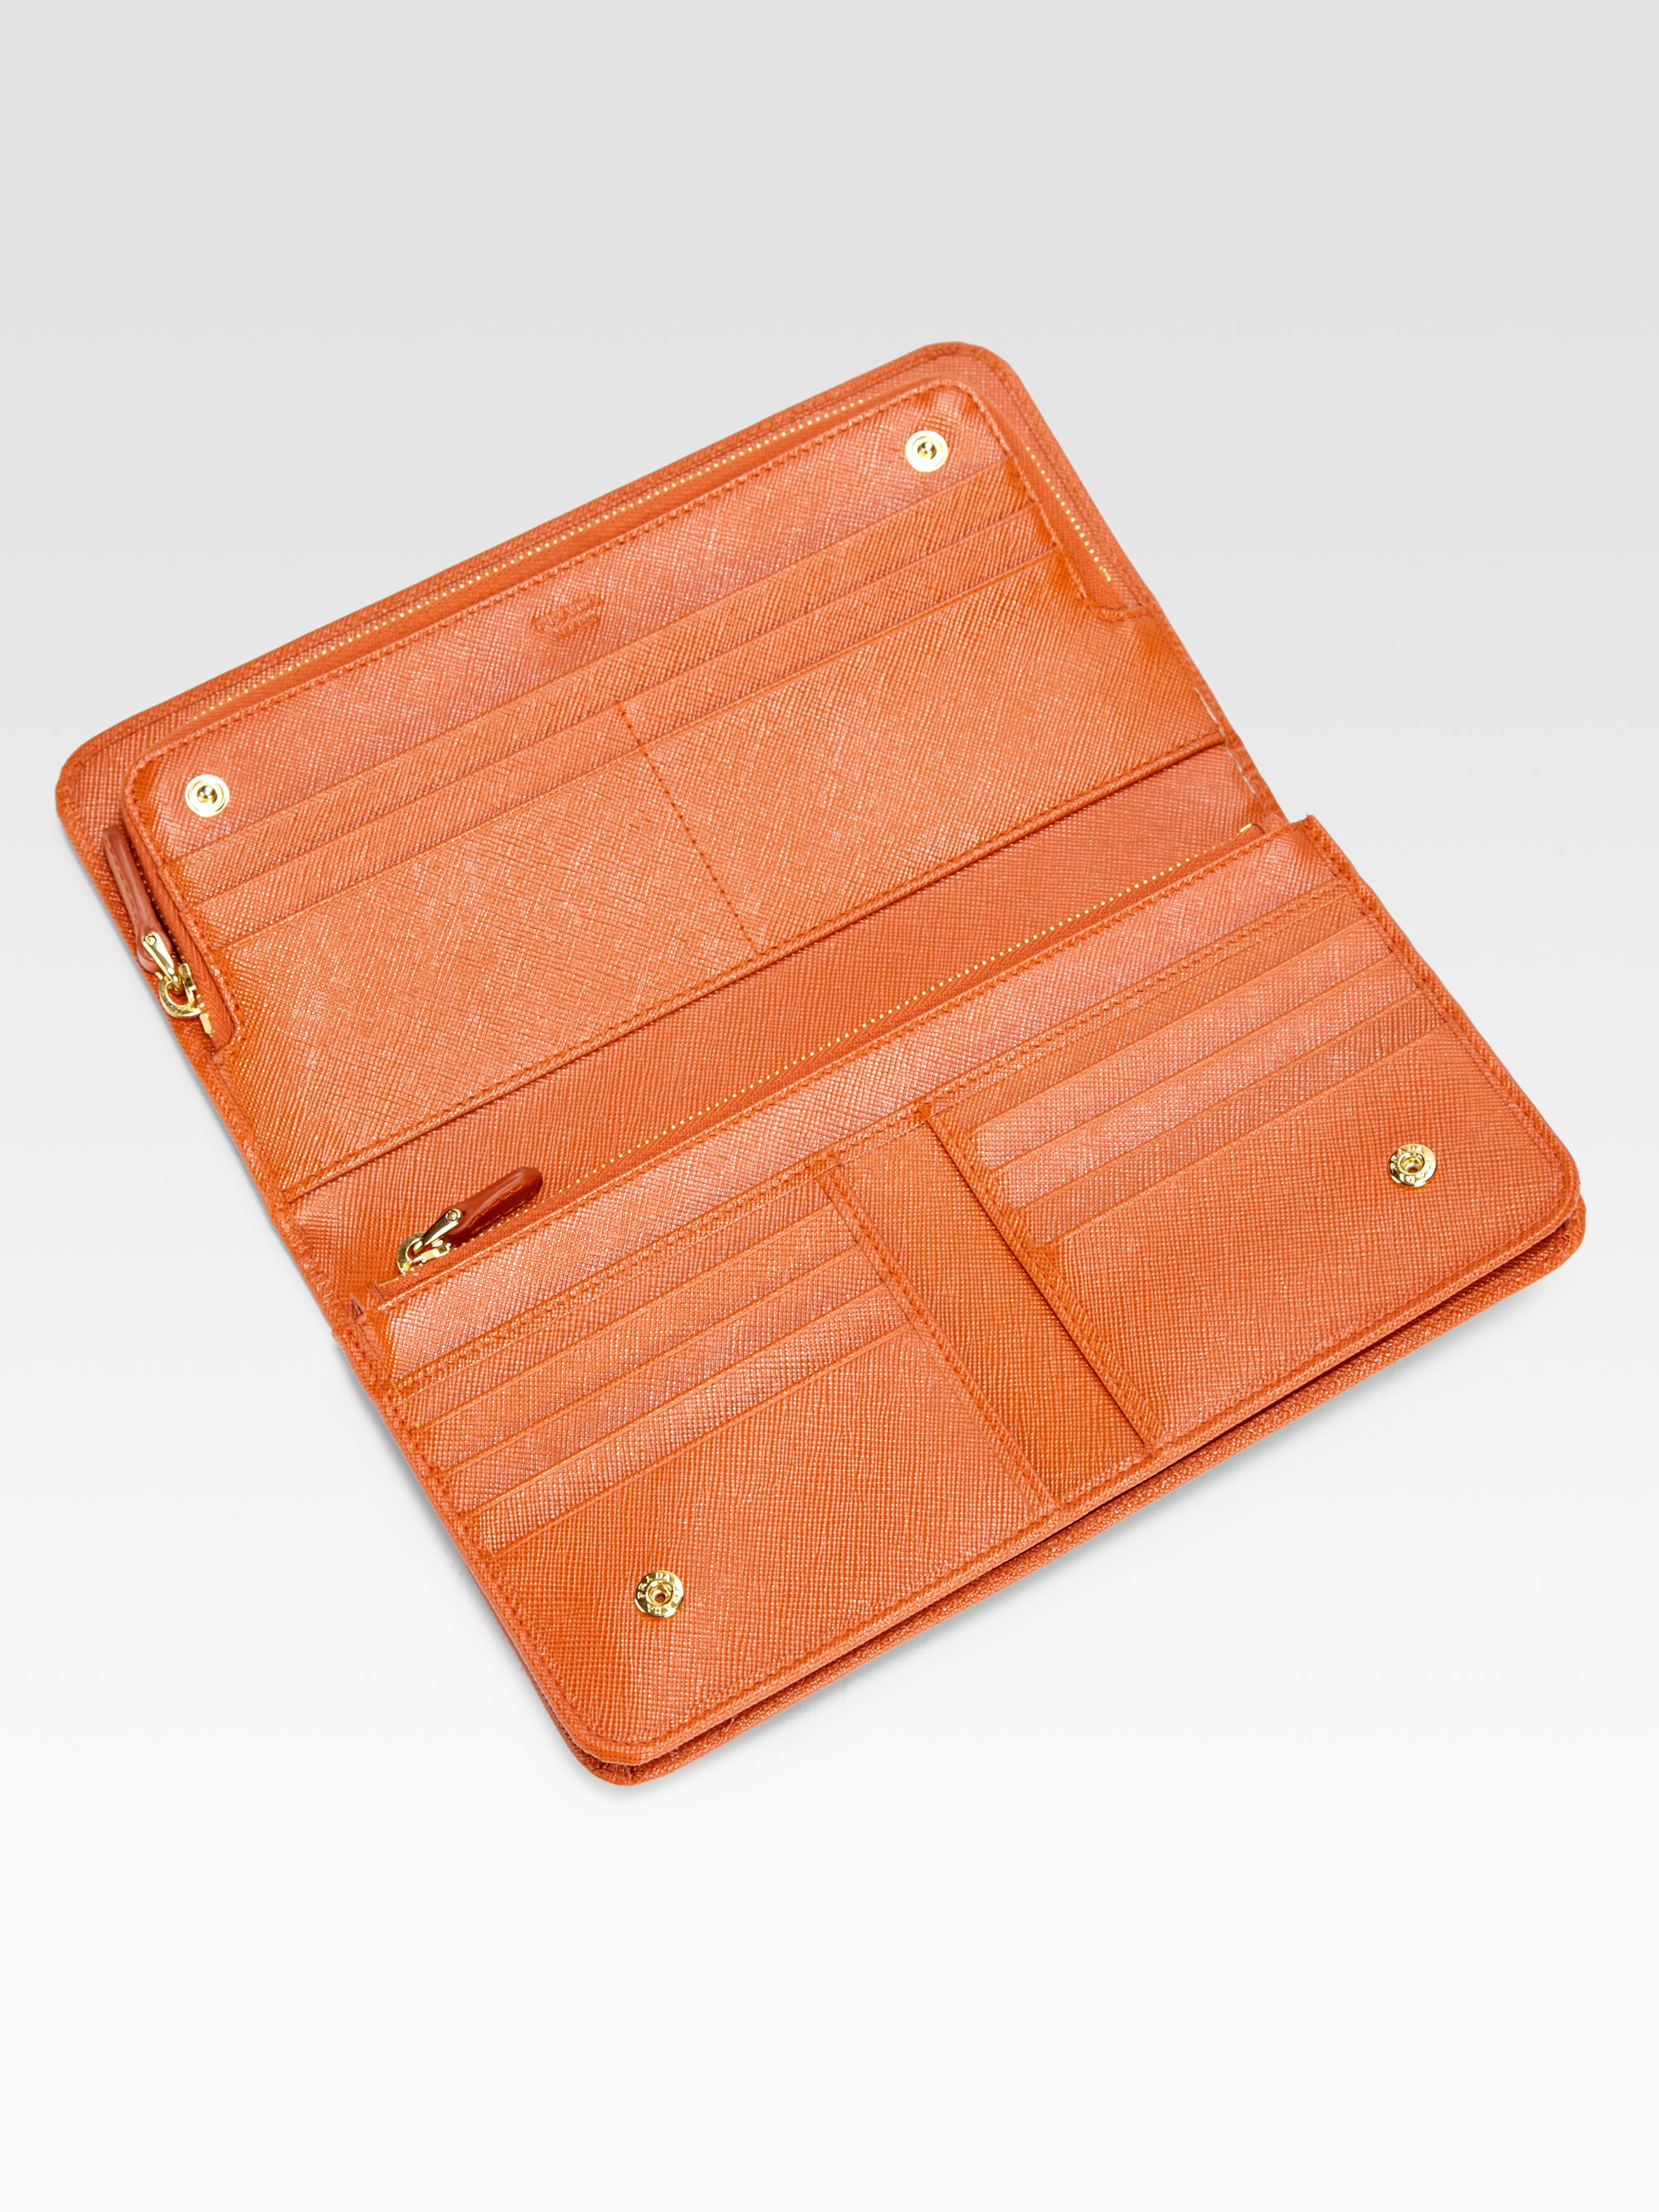 87644acd22a899 ... coupon code for lyst prada saffiano double snap travel wallet in orange  6df84 da517